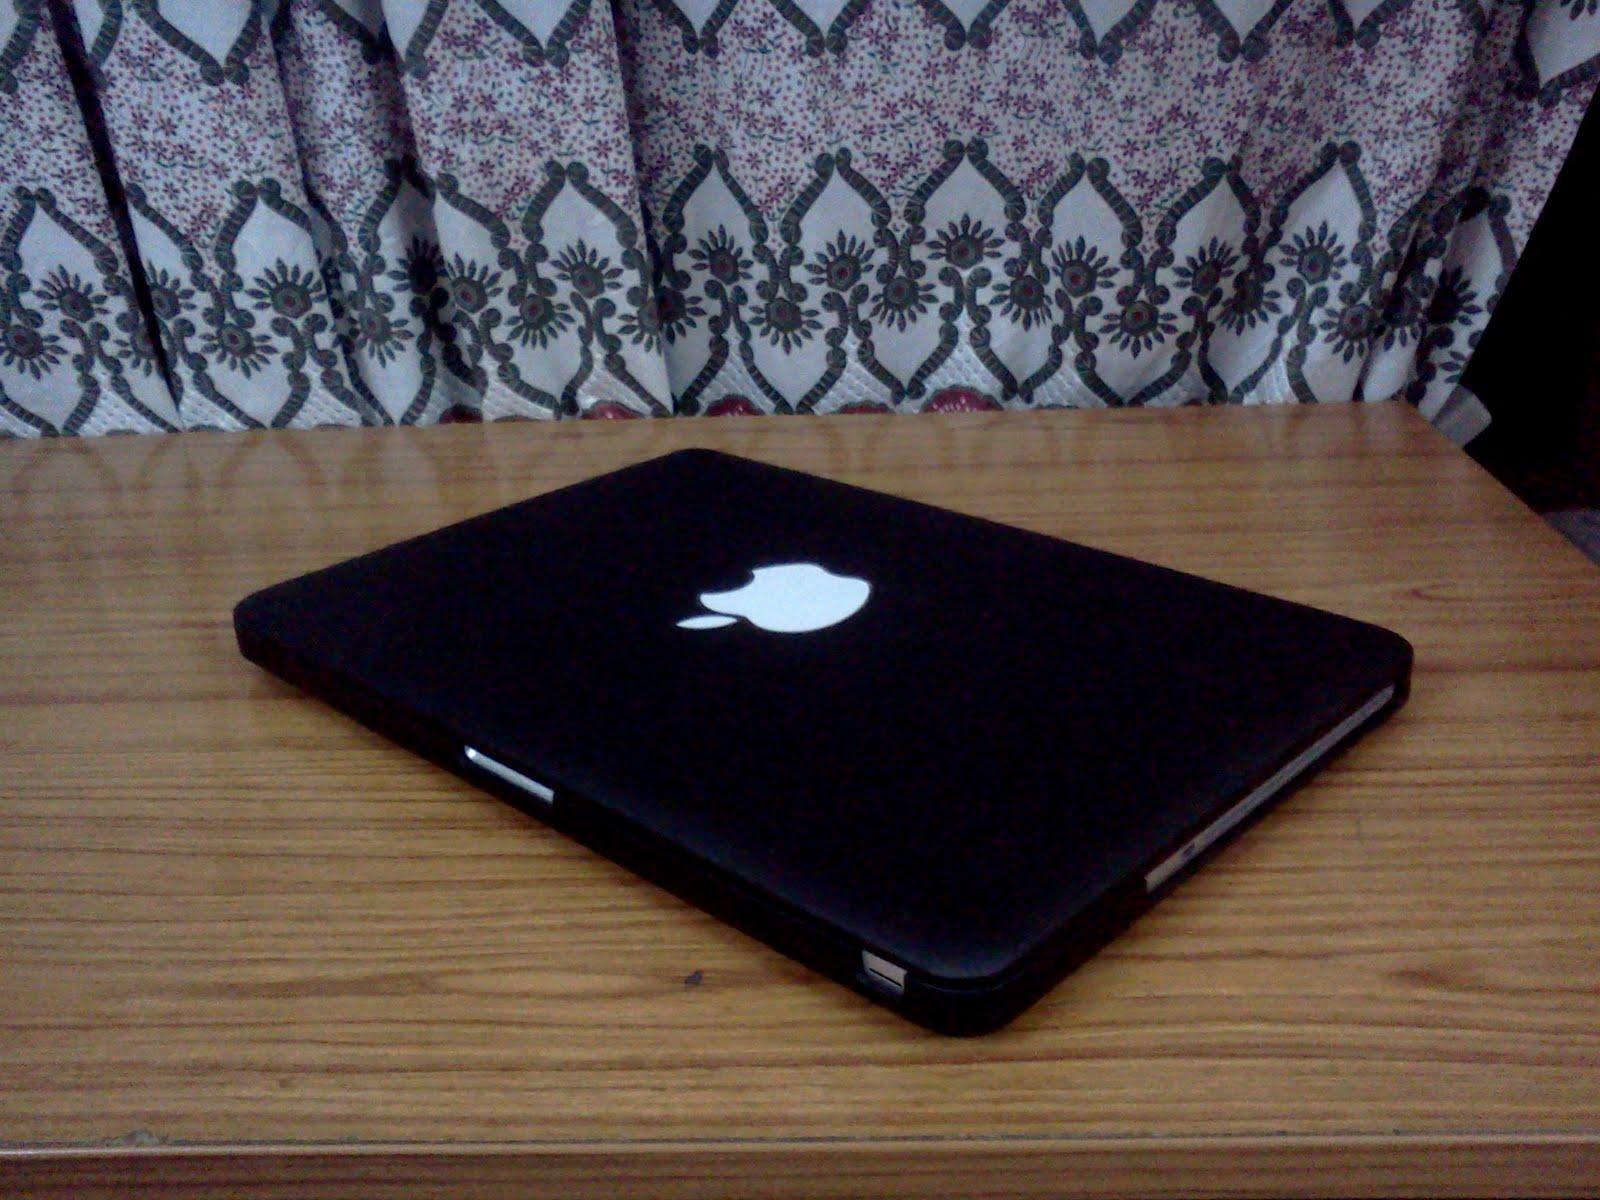 1440�900 For MacBook Pro 15, My 17 #8243; MacBook Pro Is On It's, A MacBook Pro 15 #8243; Screen)